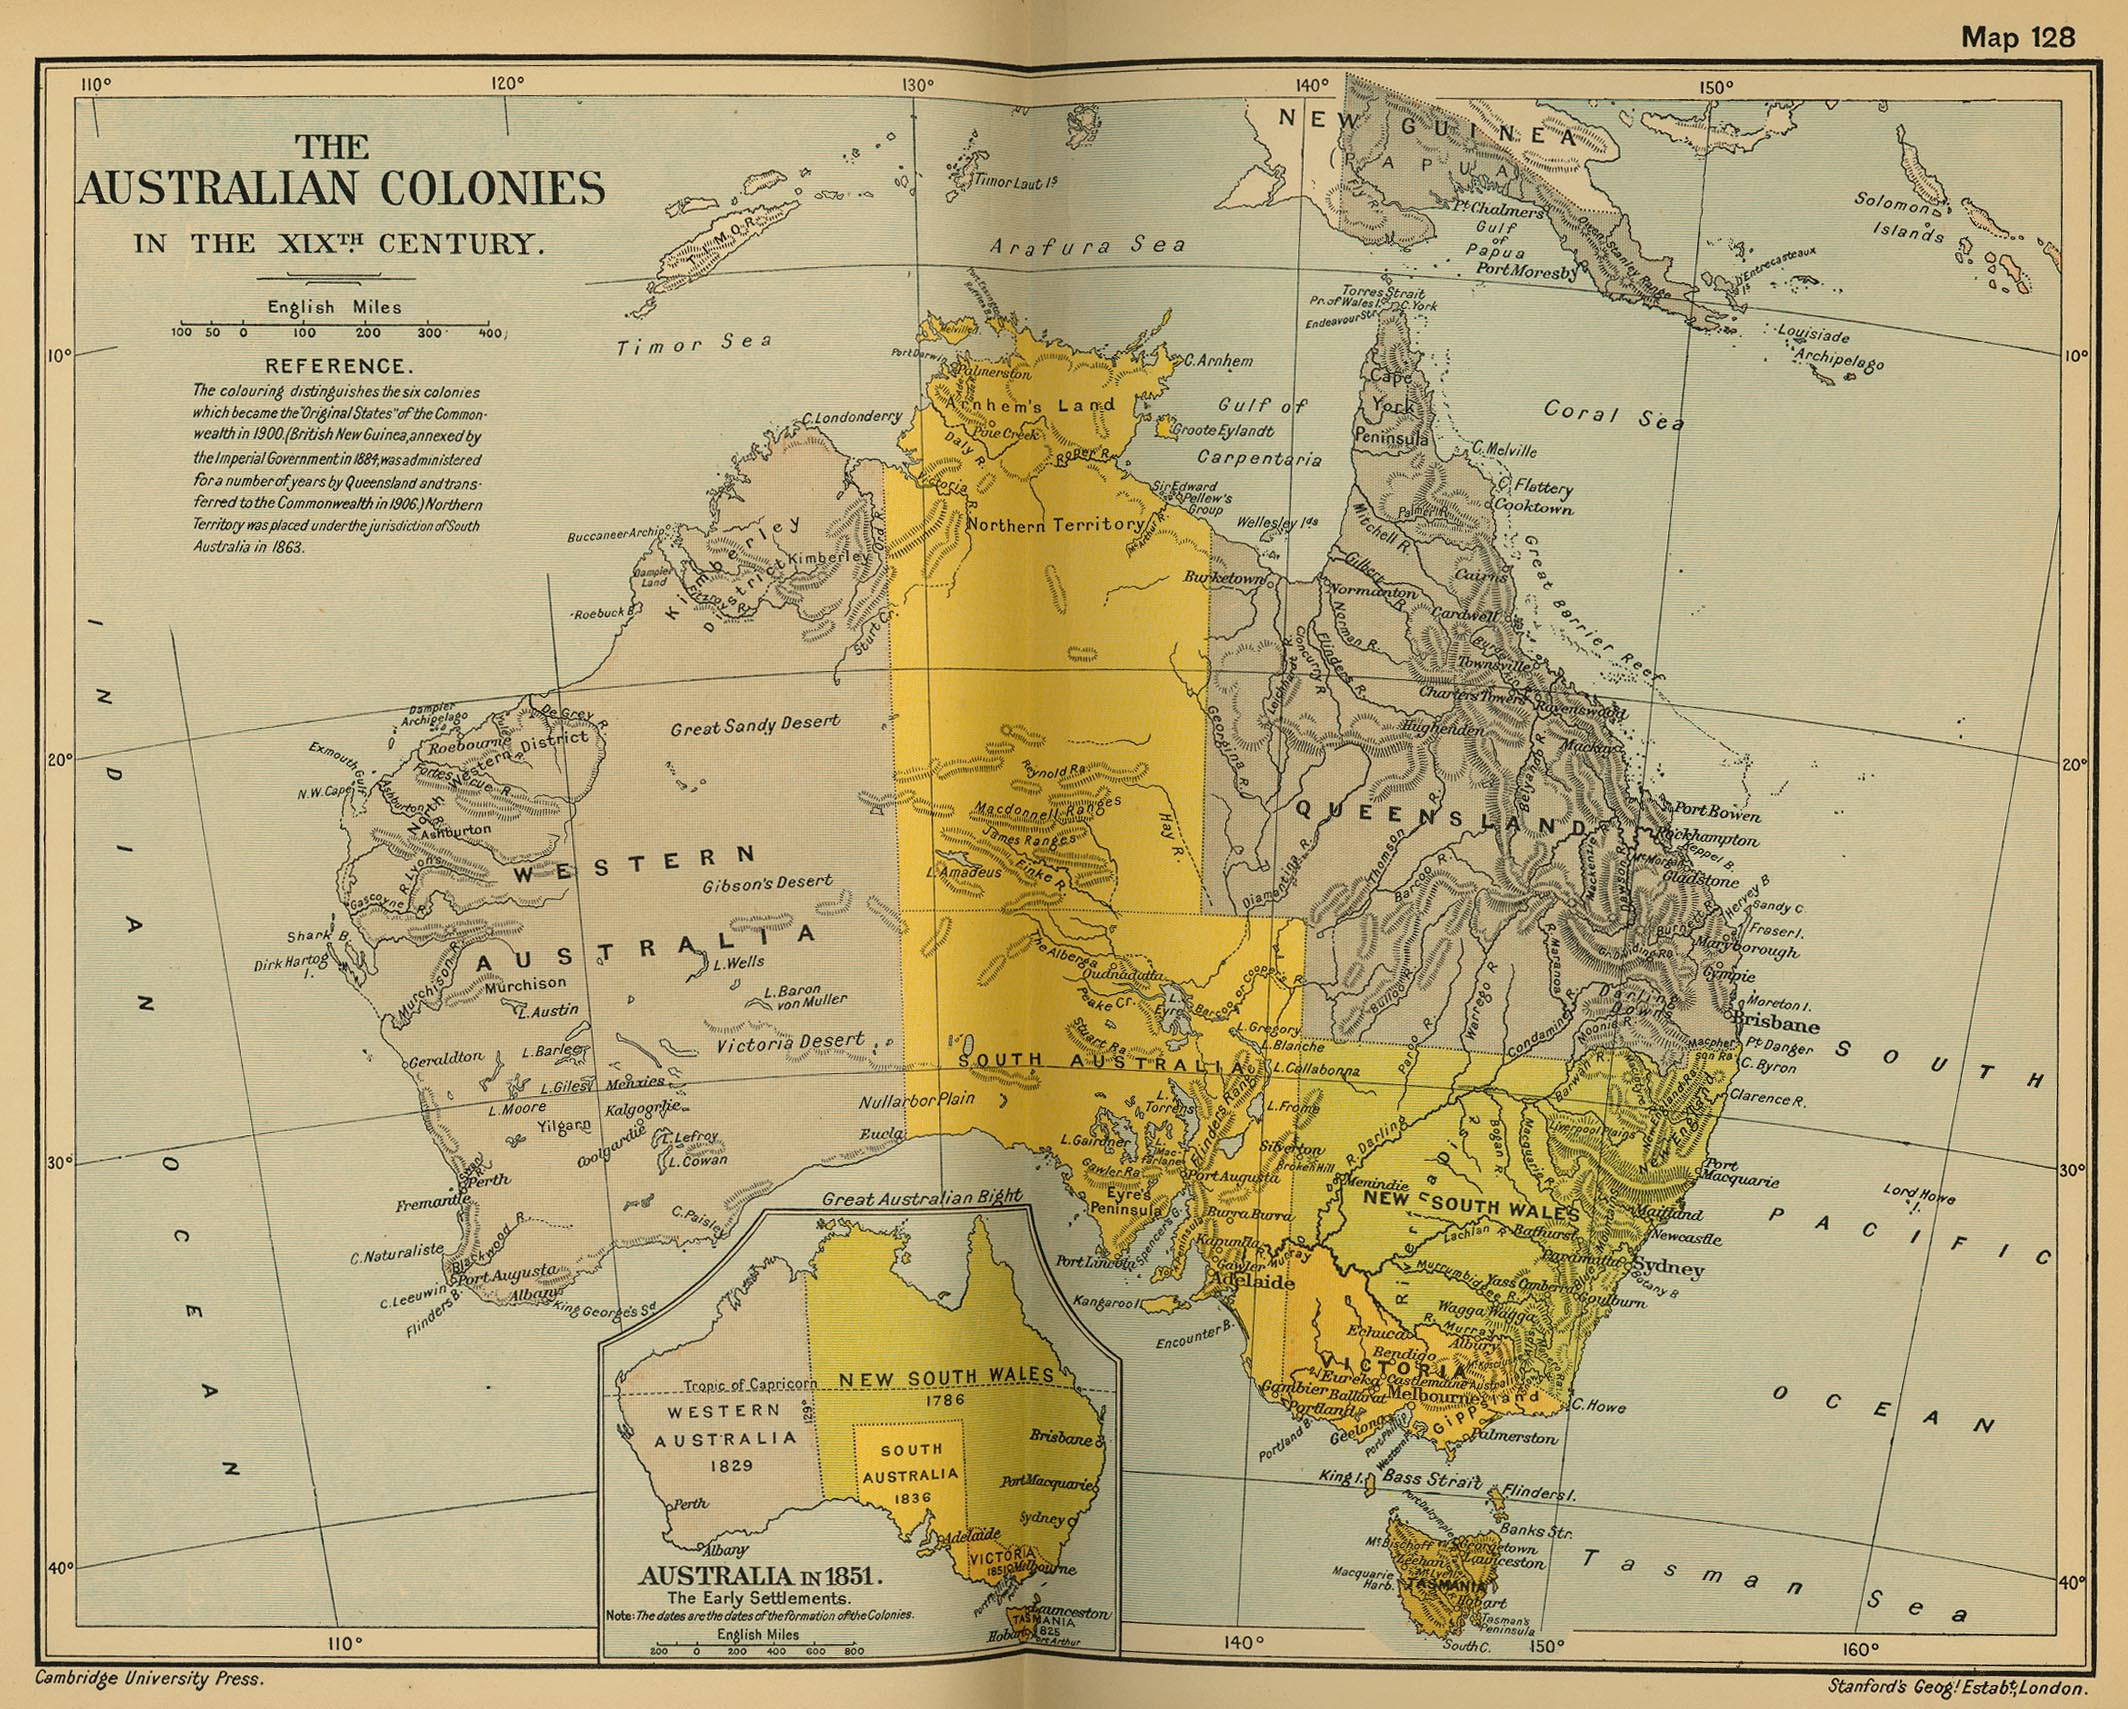 Australia Map 1900.Map Of Australia In The 19th Century